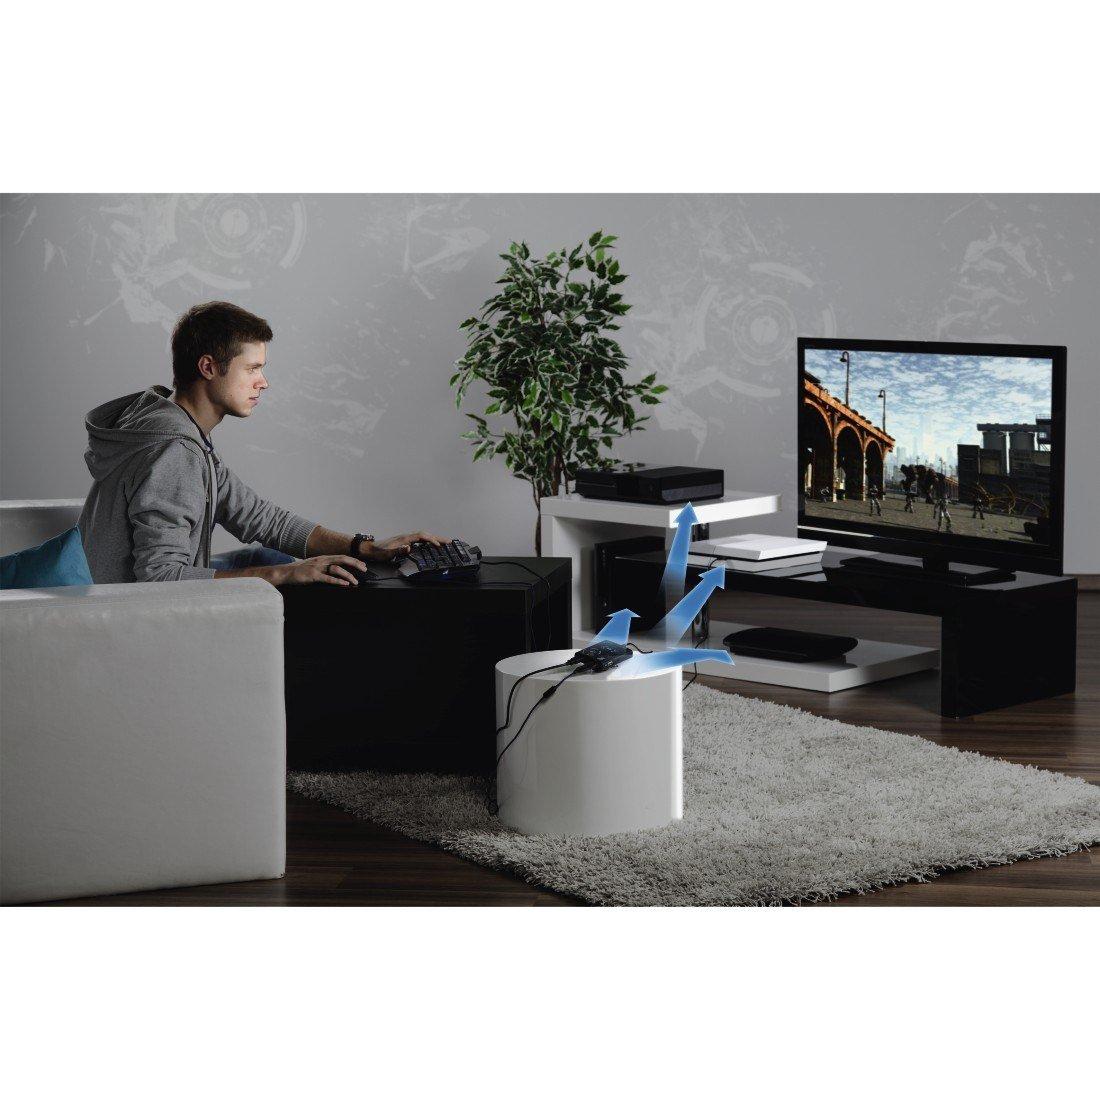 Hama Speedshot Ultimate: Produktfoto